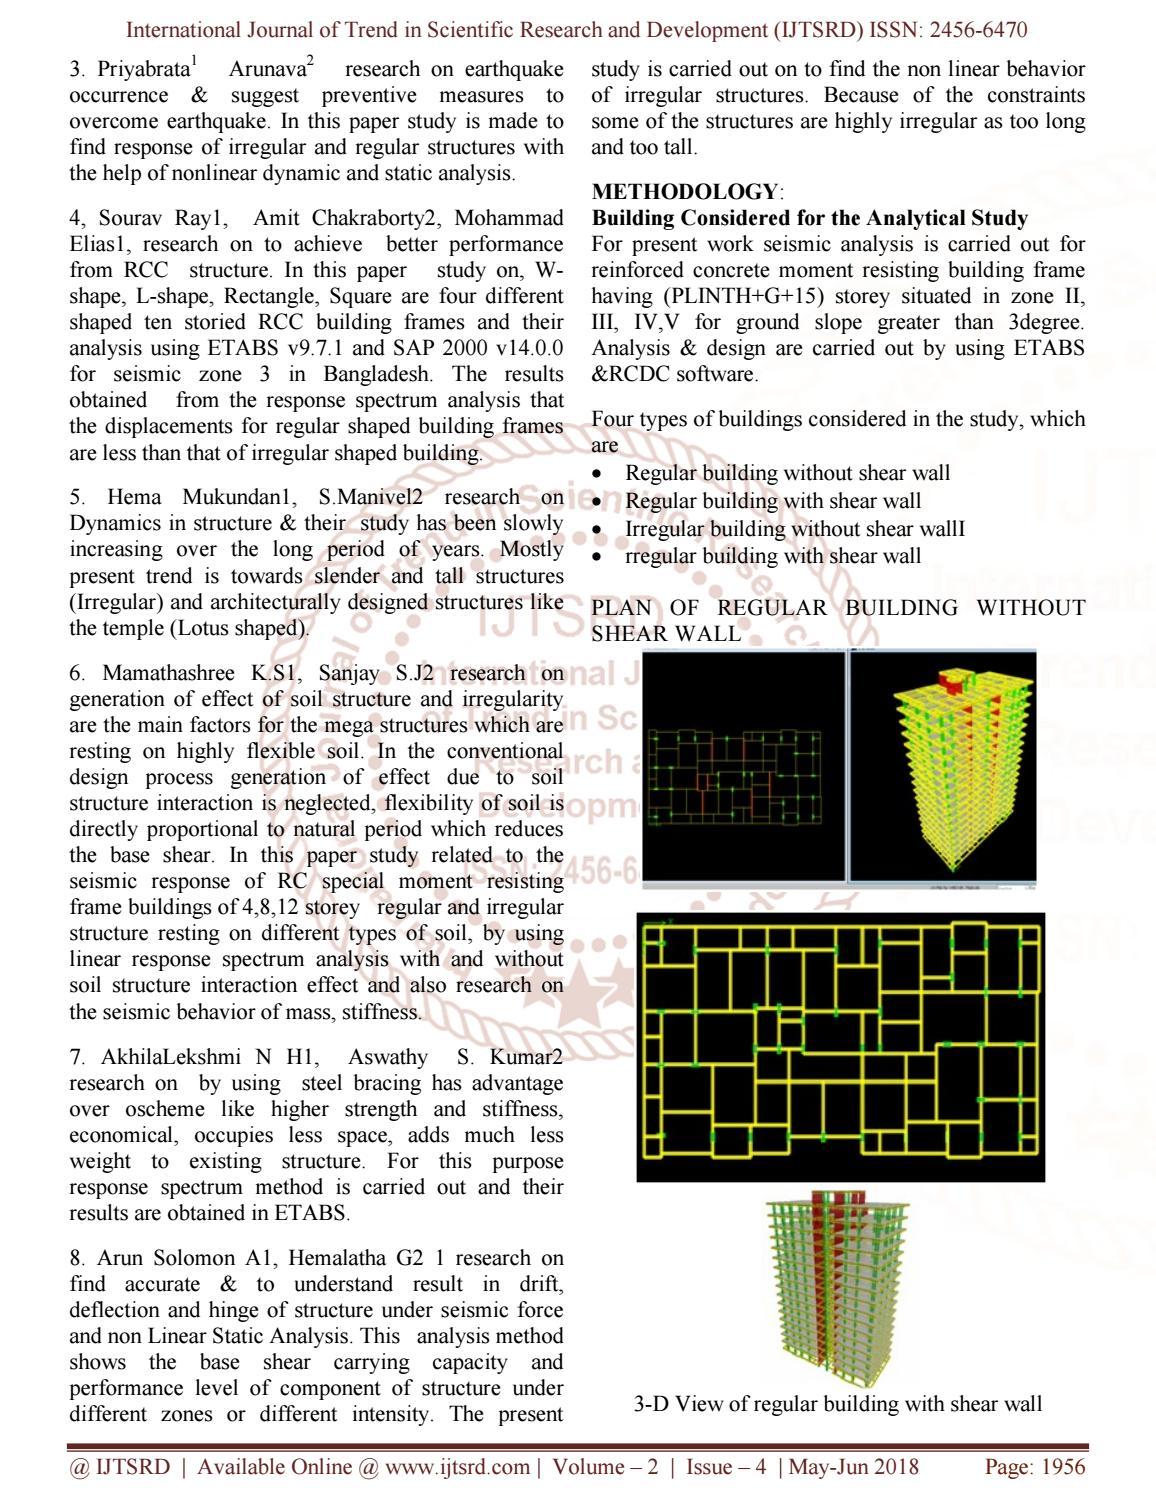 Comparative Analysis & Design of Regular & Irregular